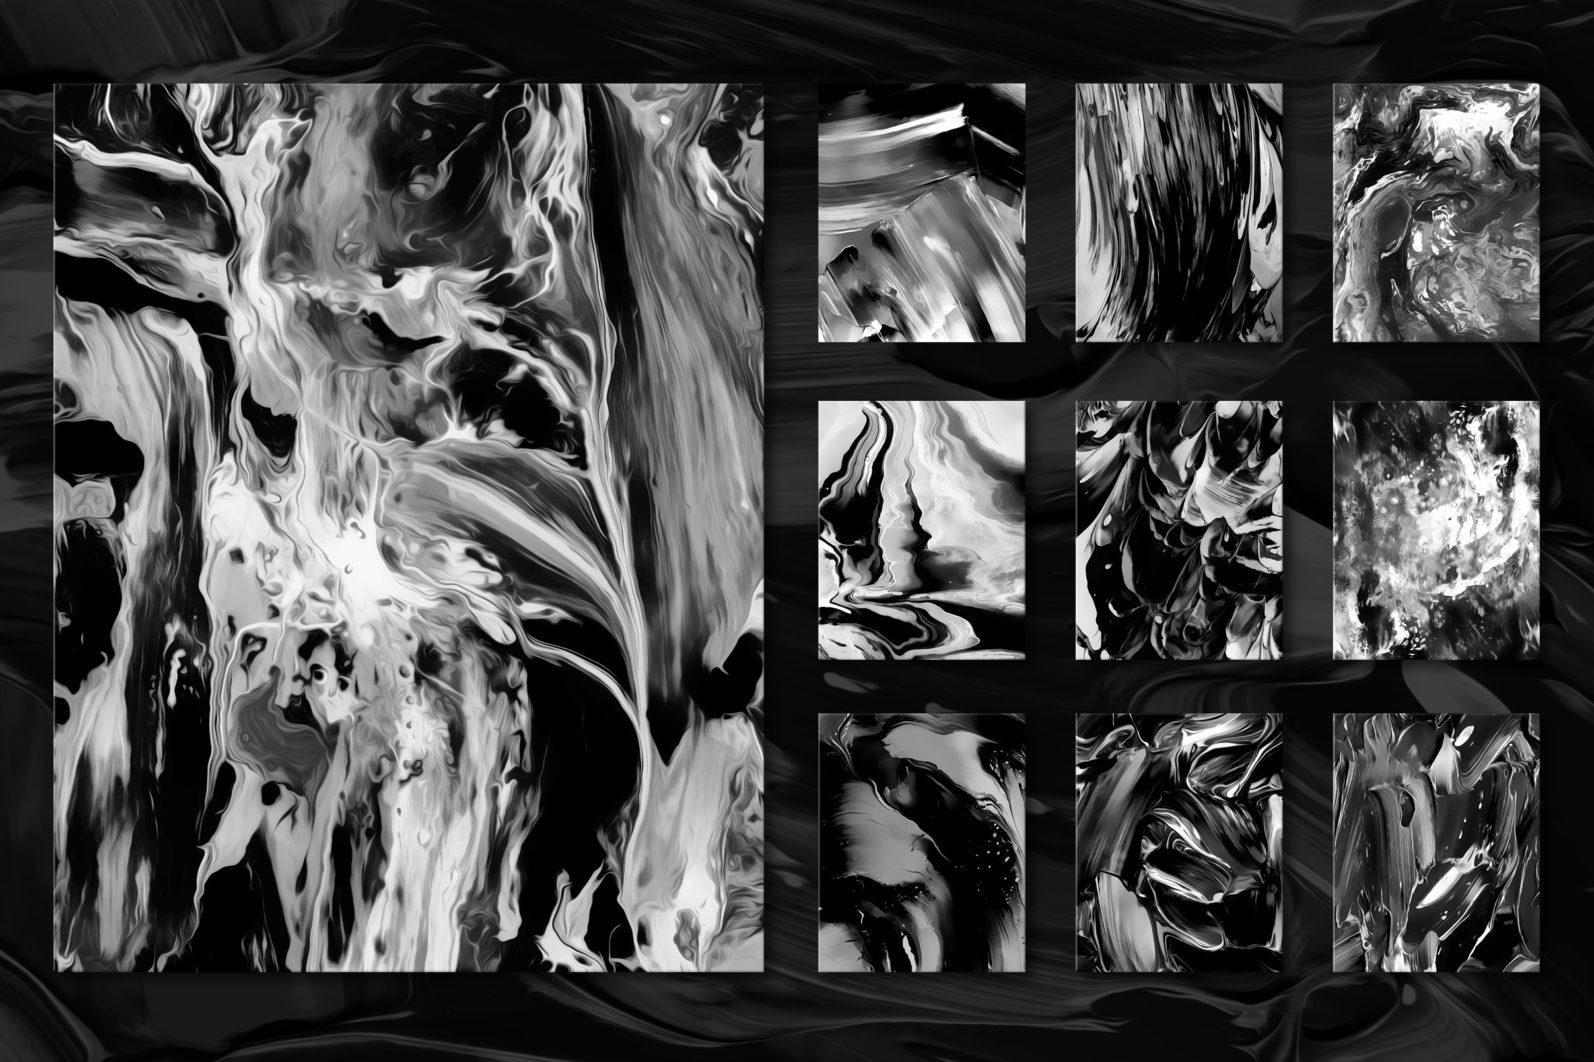 Flow, Vol. 2: 100 Smooth Paint Textures - Flow Vol 2 Preview 08 -